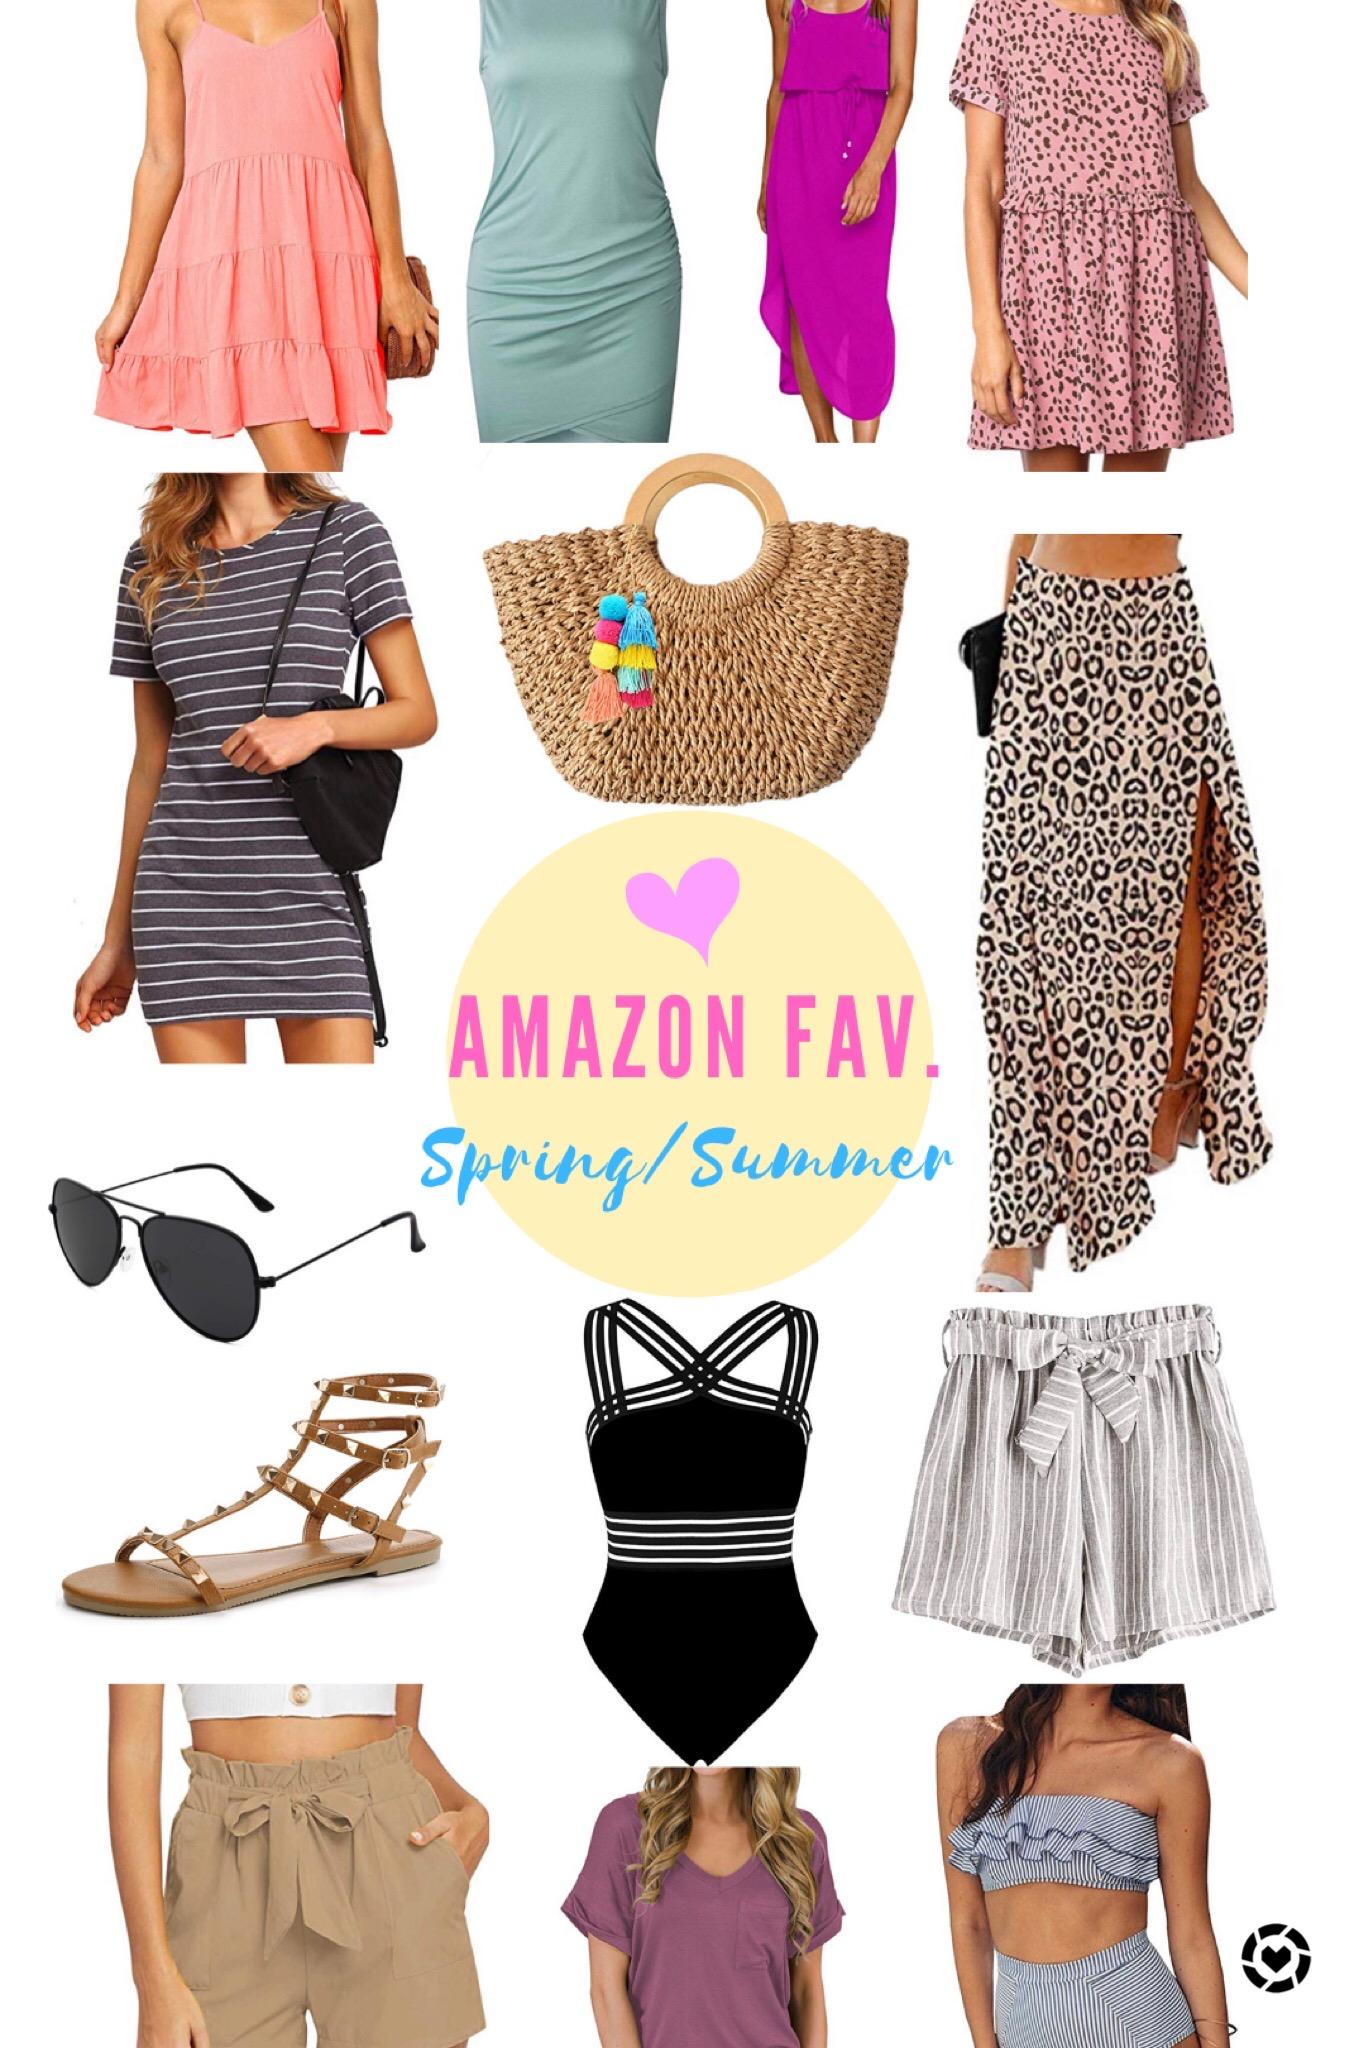 Amazon Spring & Summer Favs.